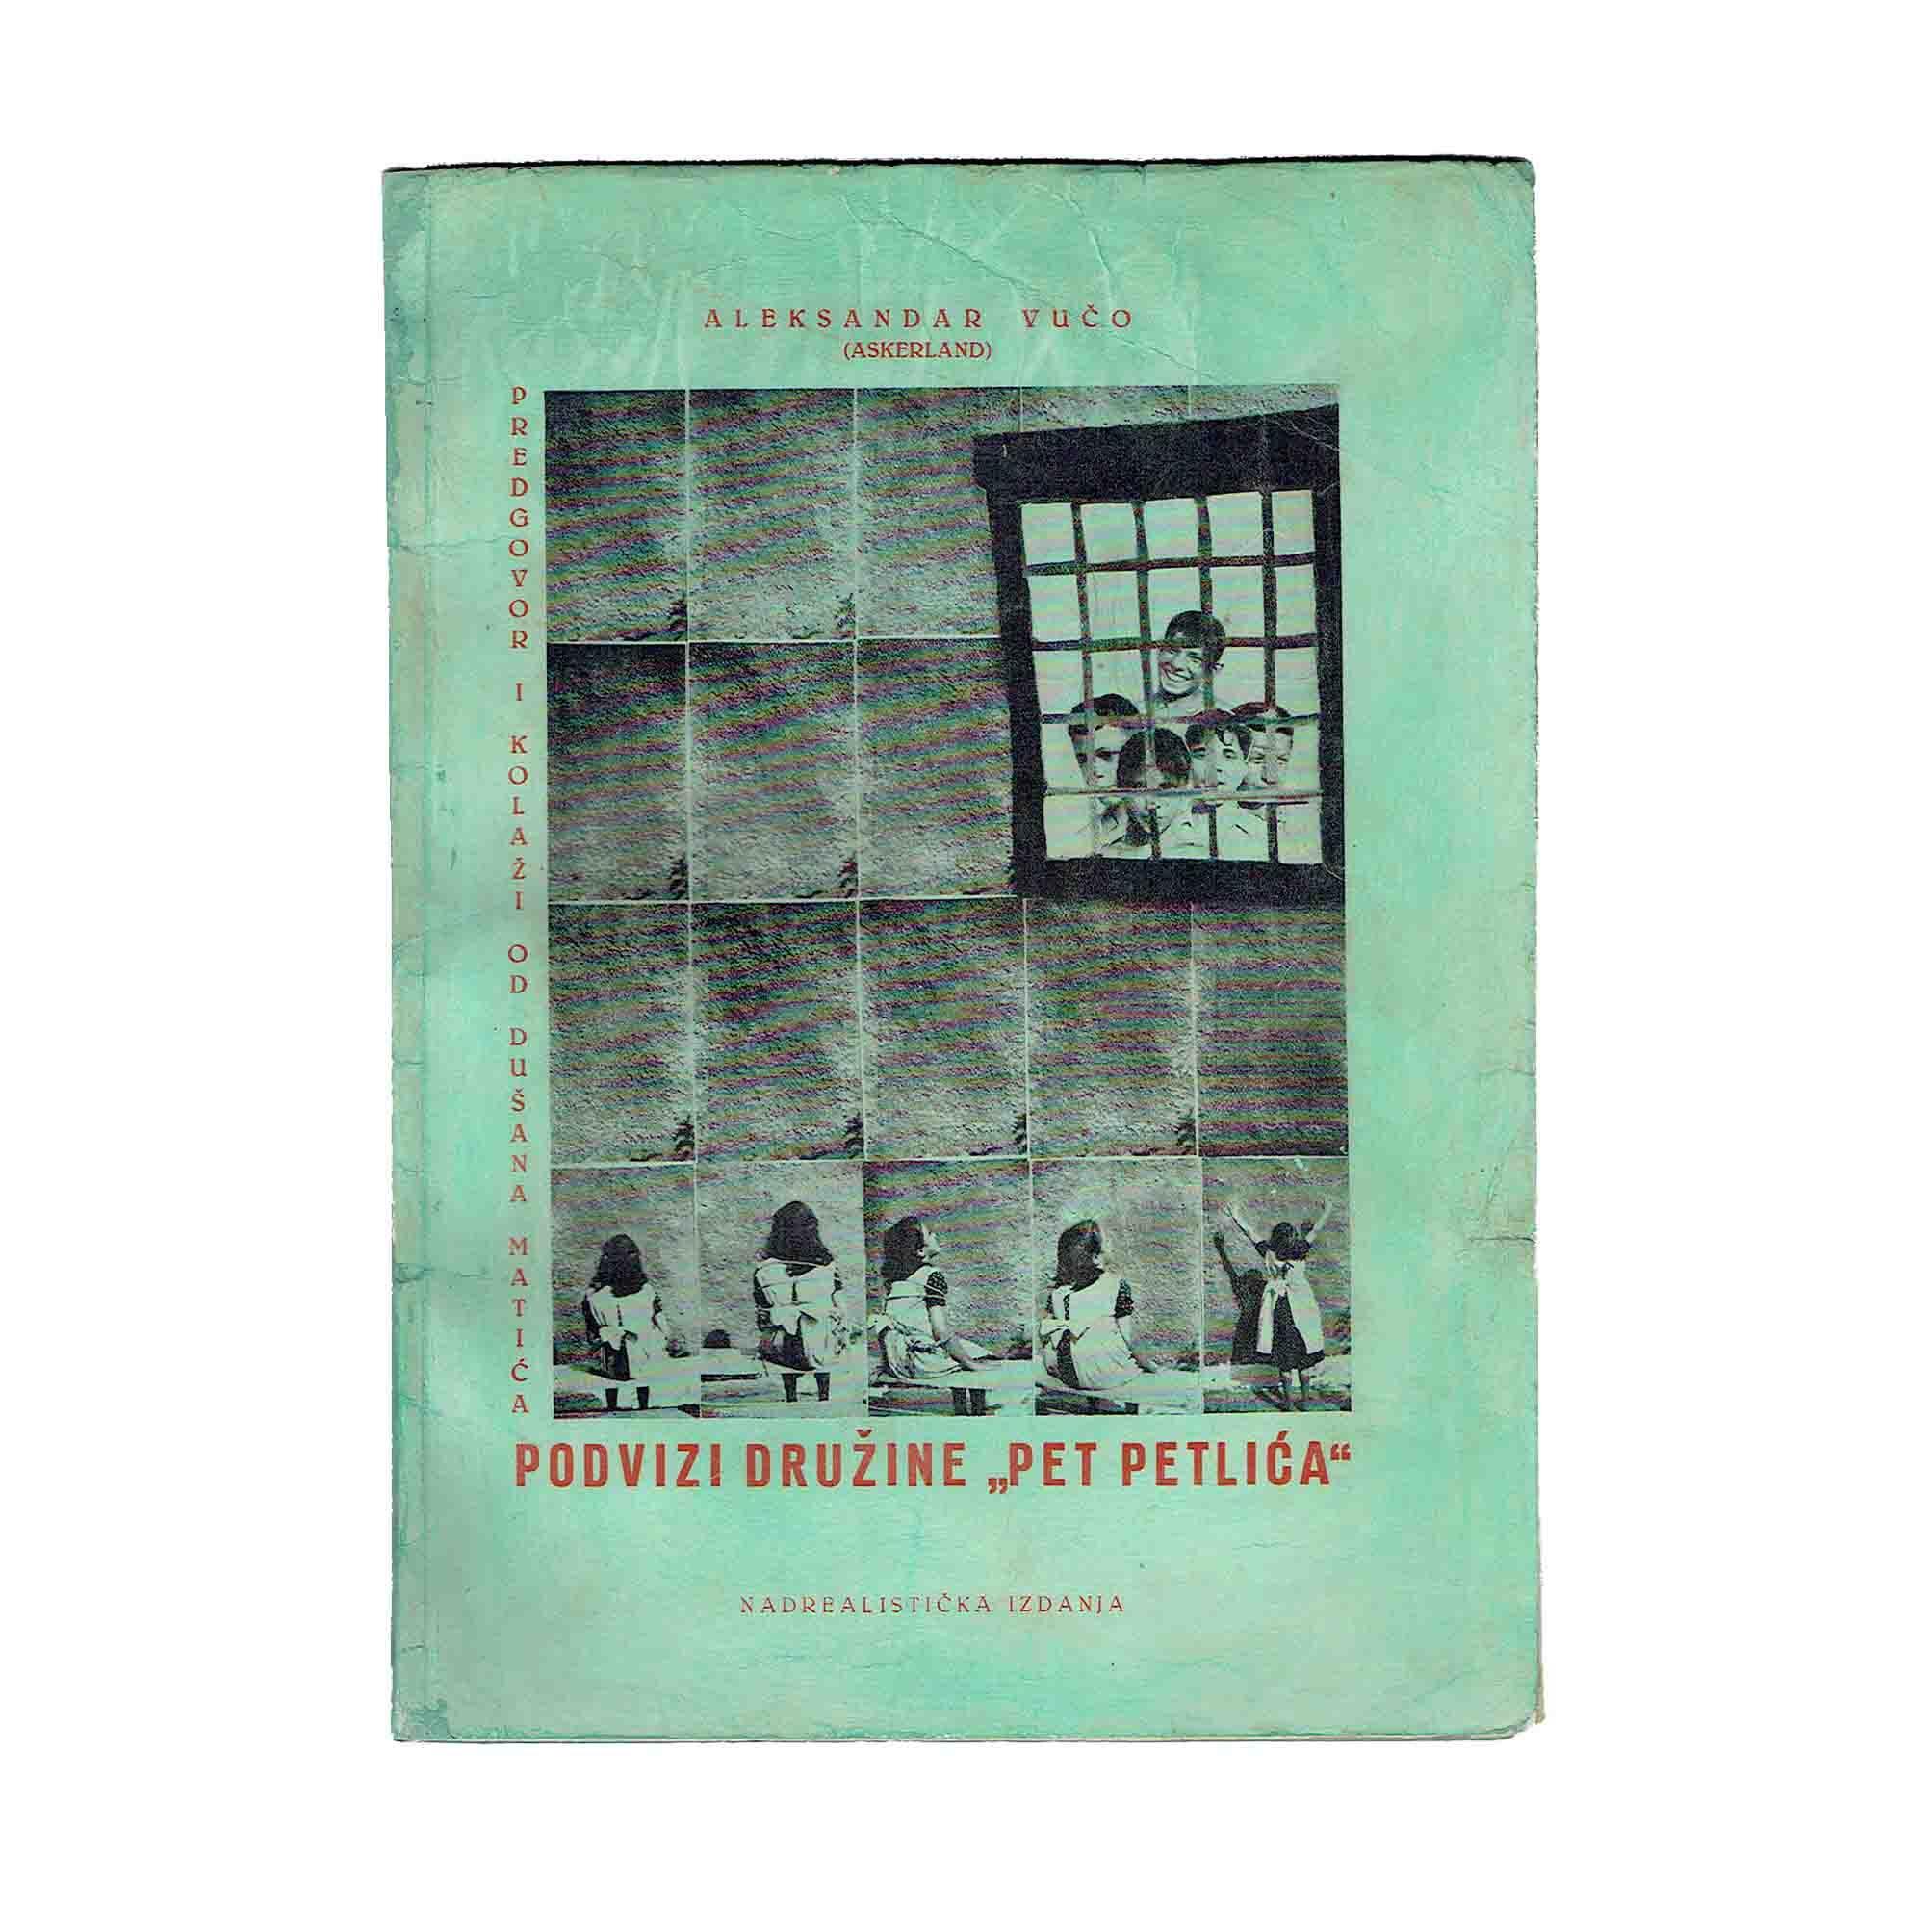 5694 Vuco Matic Pet Petlica 1933 Cover free N